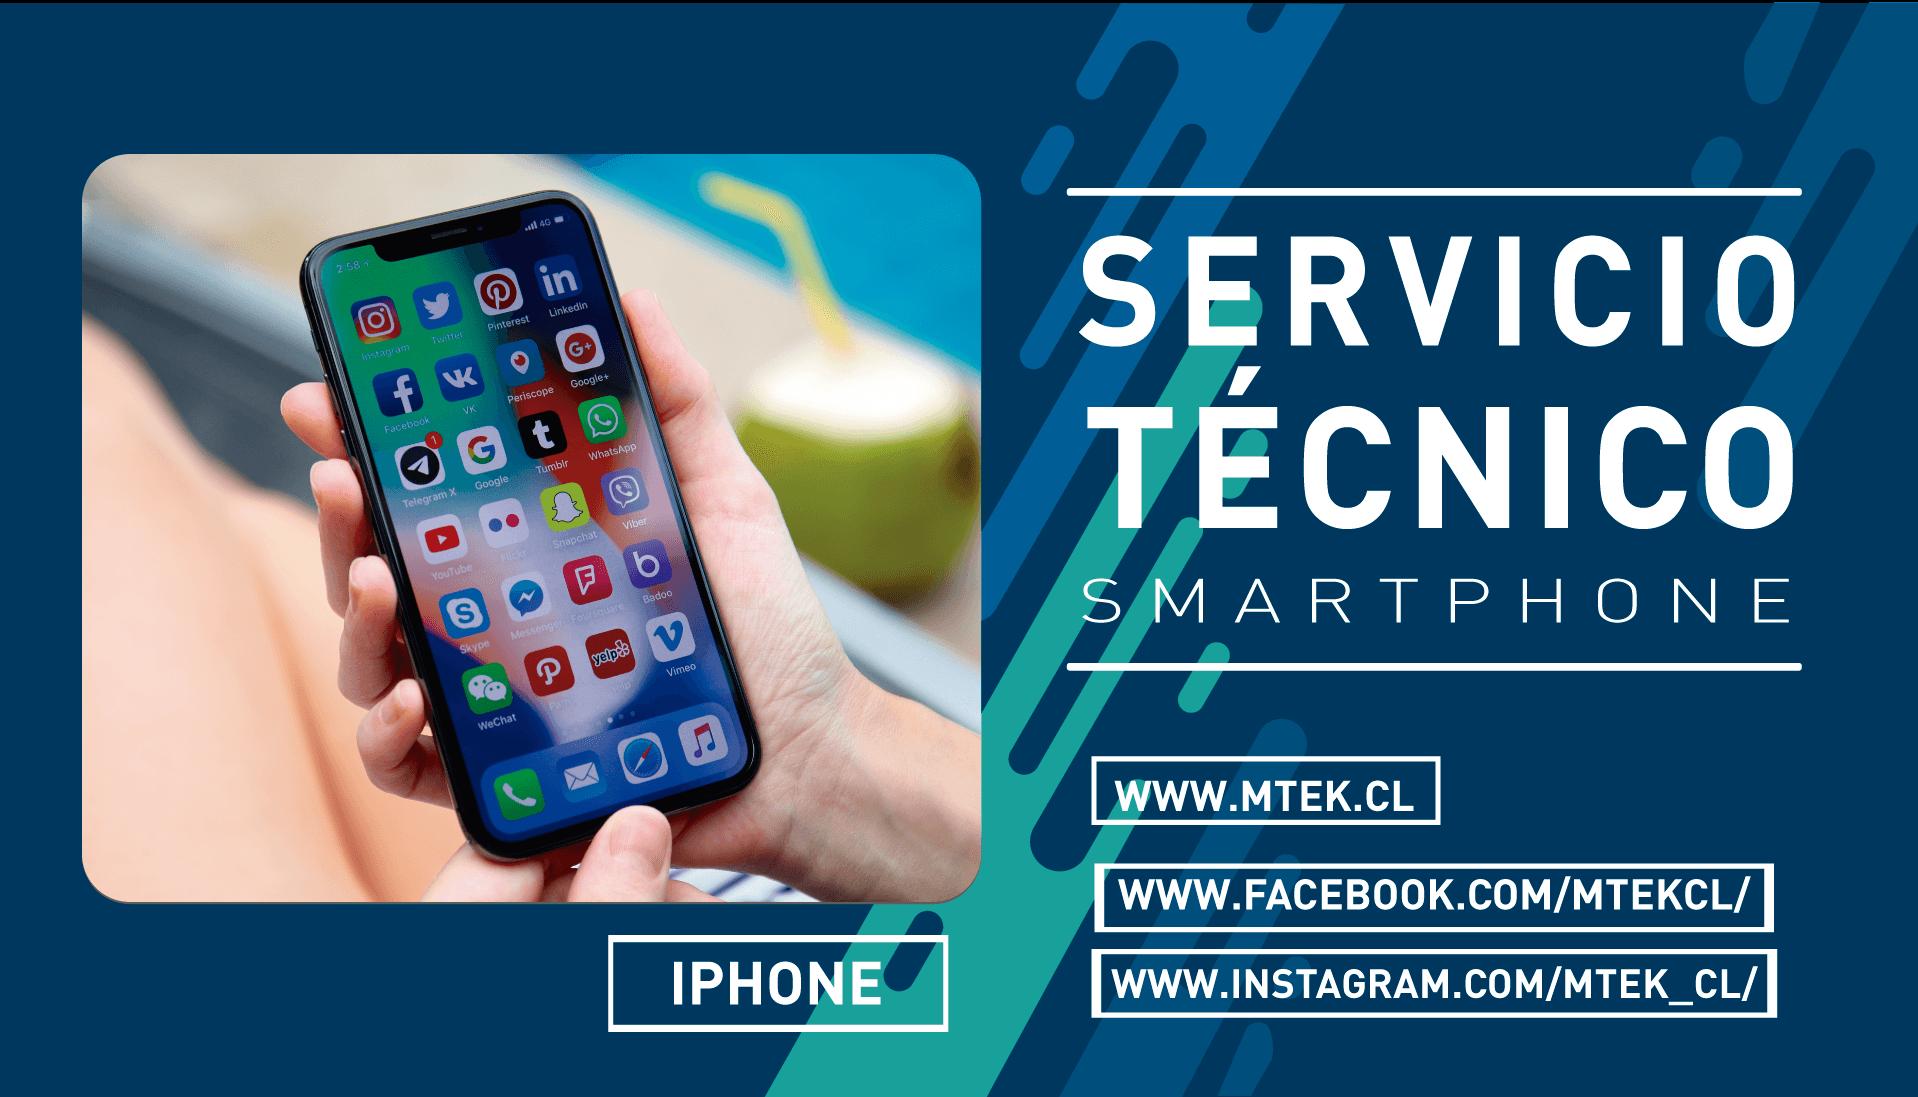 a50b9a995e2 Mtek - Venta de SmartPhones, Servicio Técnico y Accesorios de Celulares